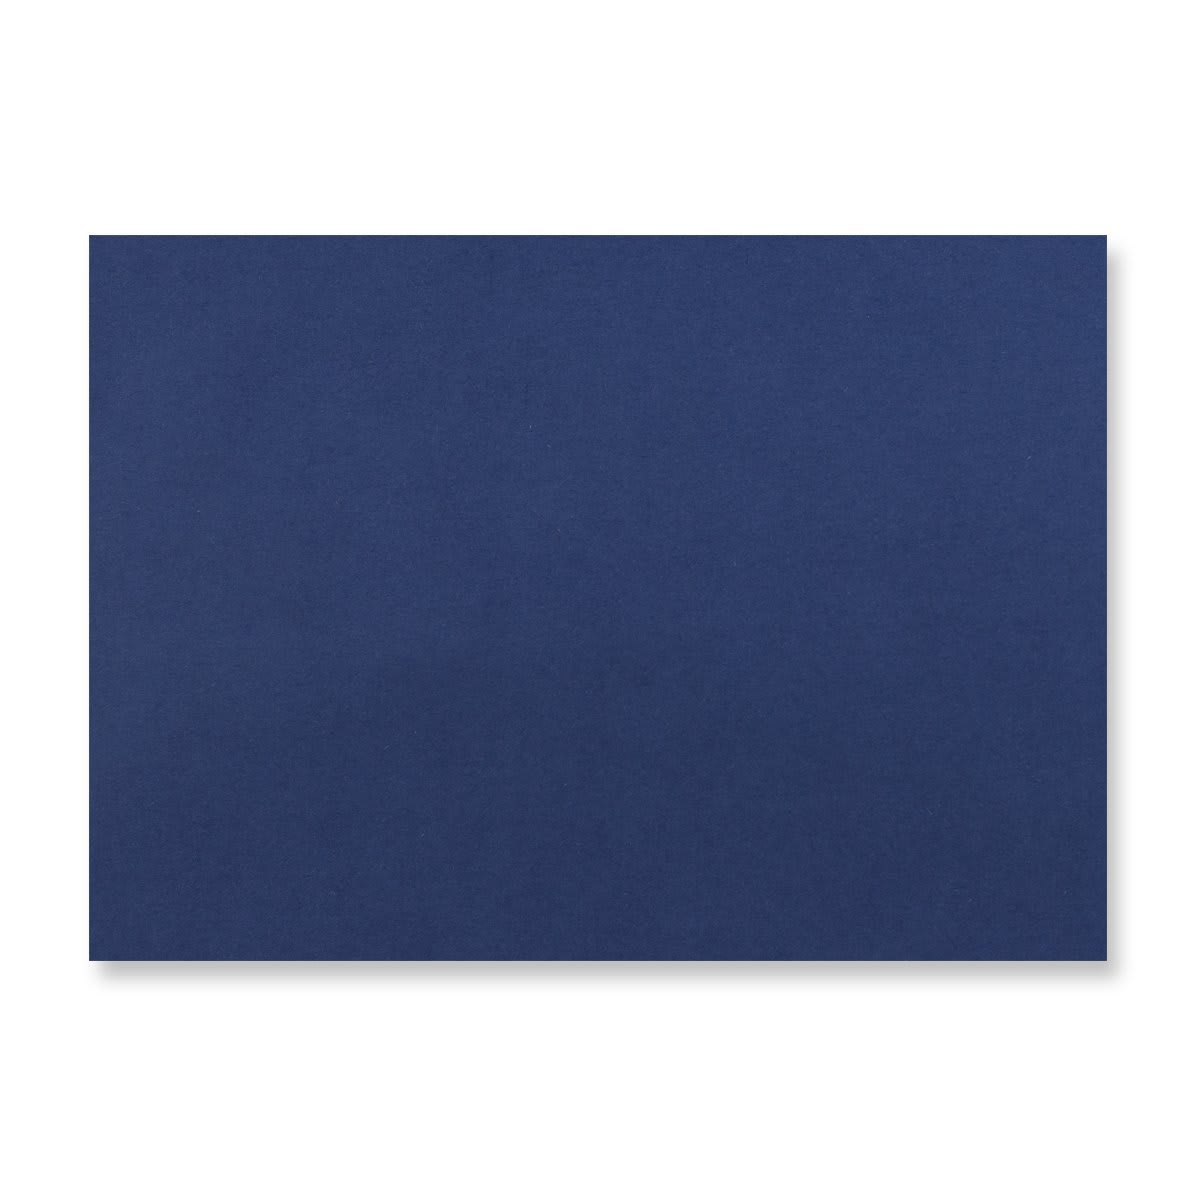 C6 NAVY BLUE V-FLAP PEEL AND SEAL ENVELOPES